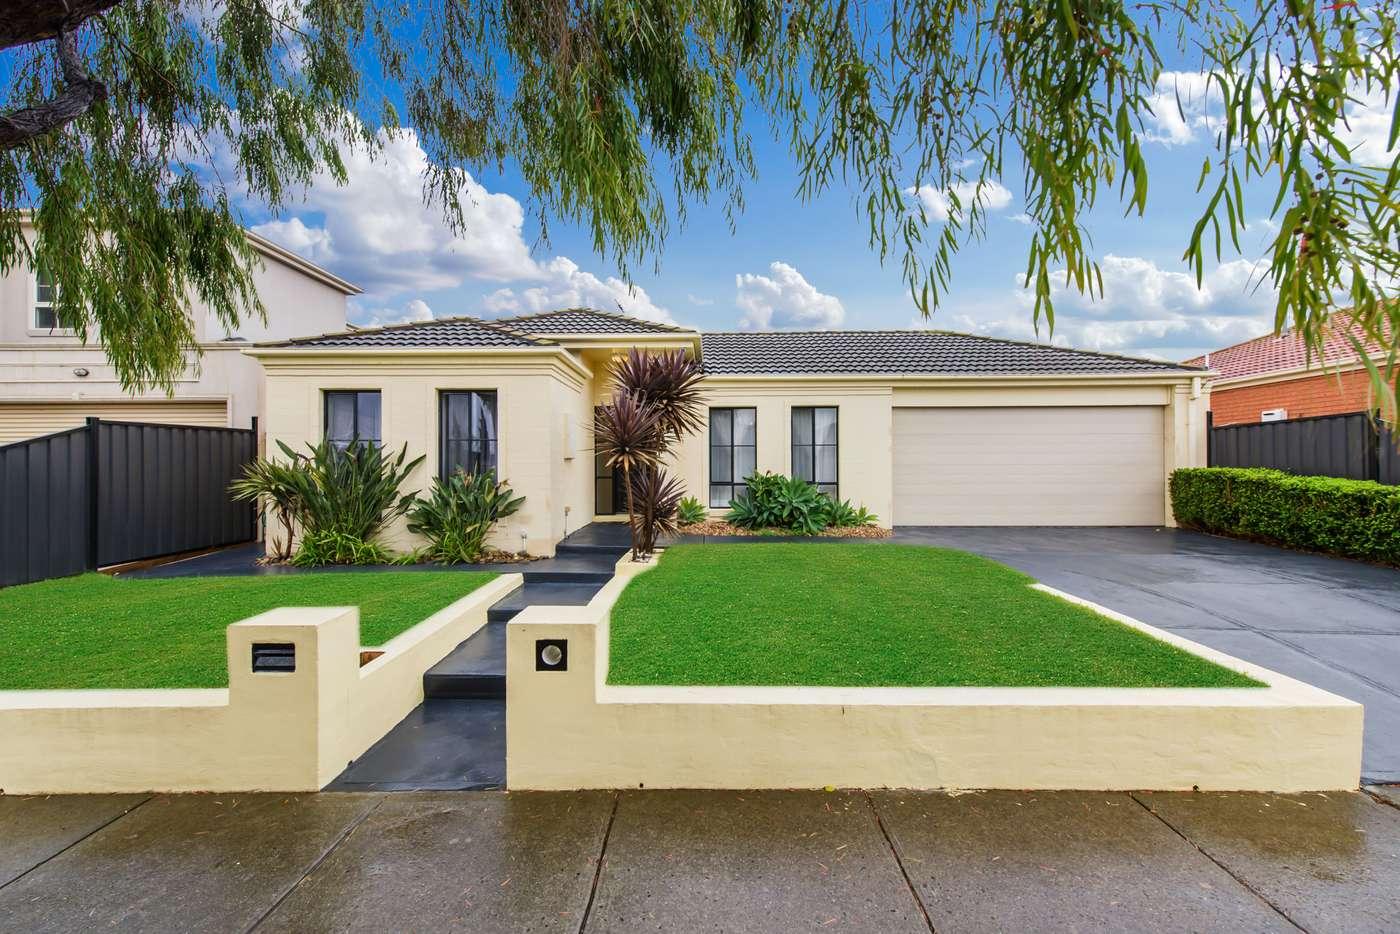 Main view of Homely house listing, 4 Oriana Way, Sydenham VIC 3037